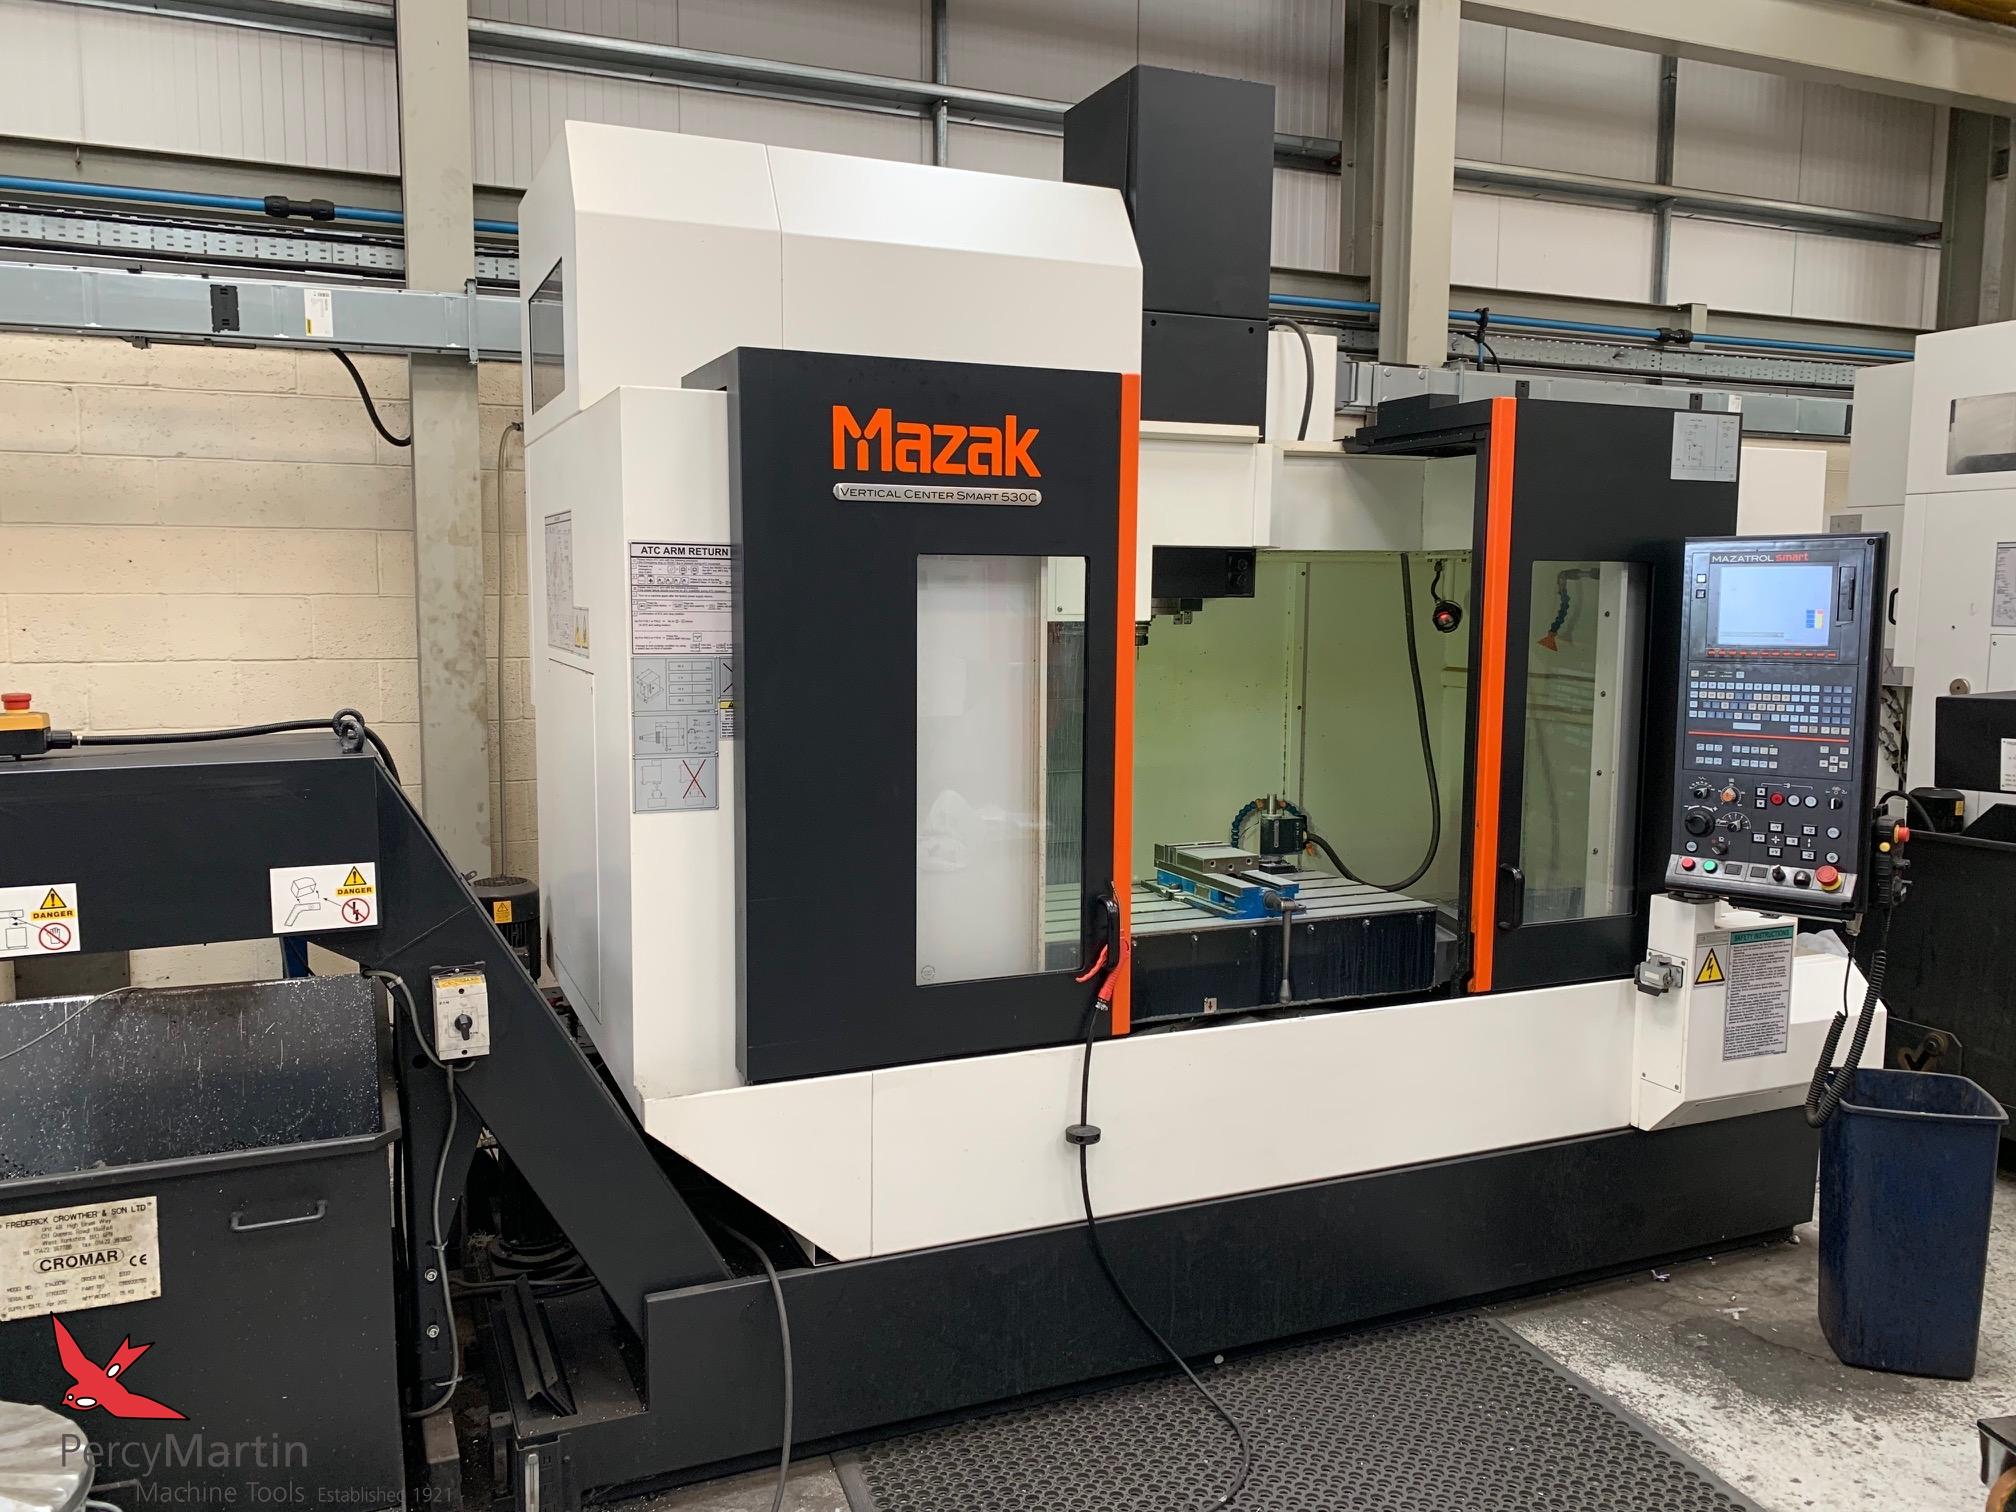 used Mazak Smart 530C 2014 Vertical Machining Centres for